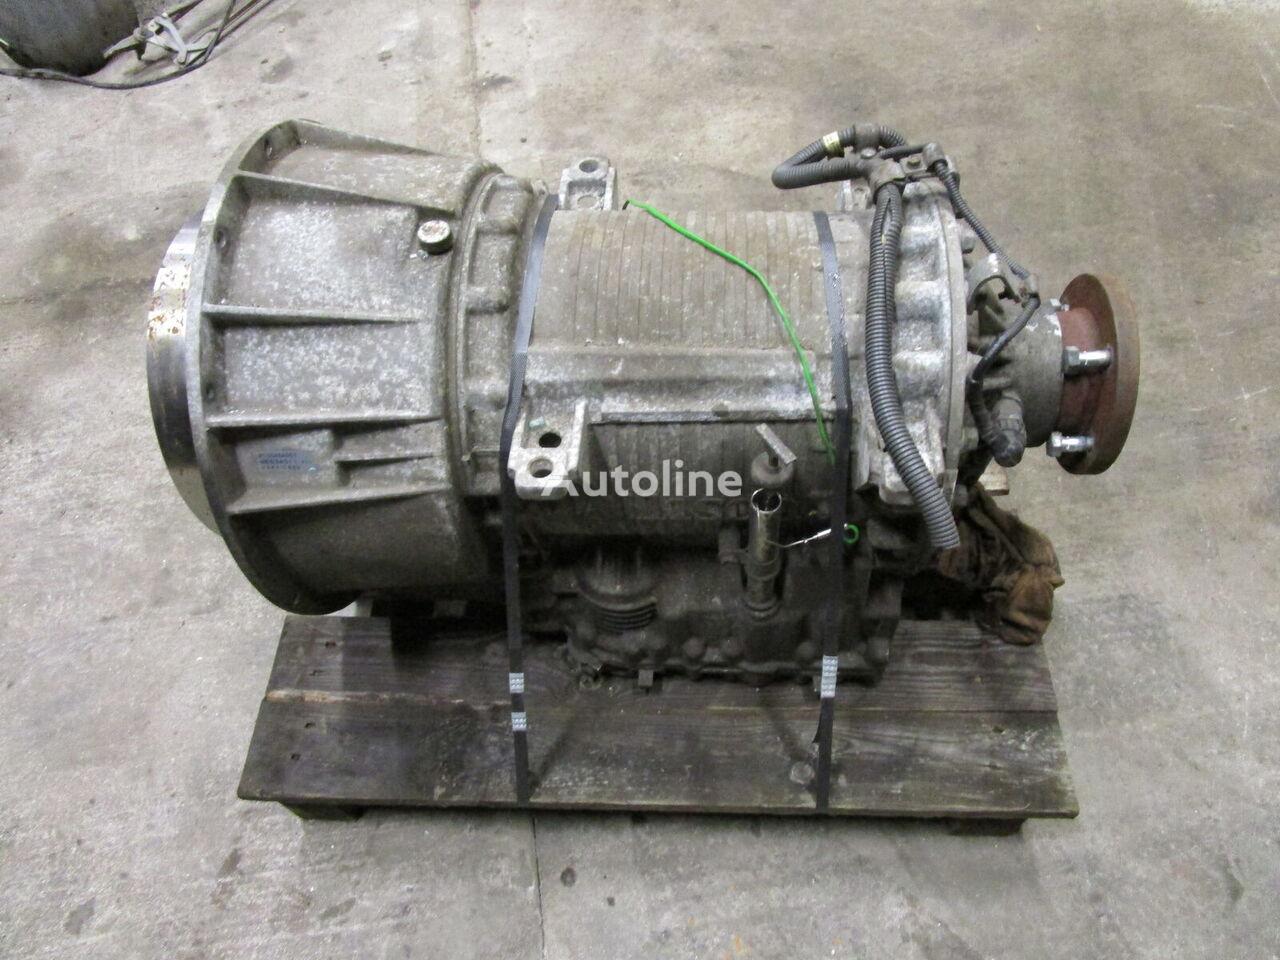 Allison 2000 SERIES 09H10 (T1DA) gearbox for truck